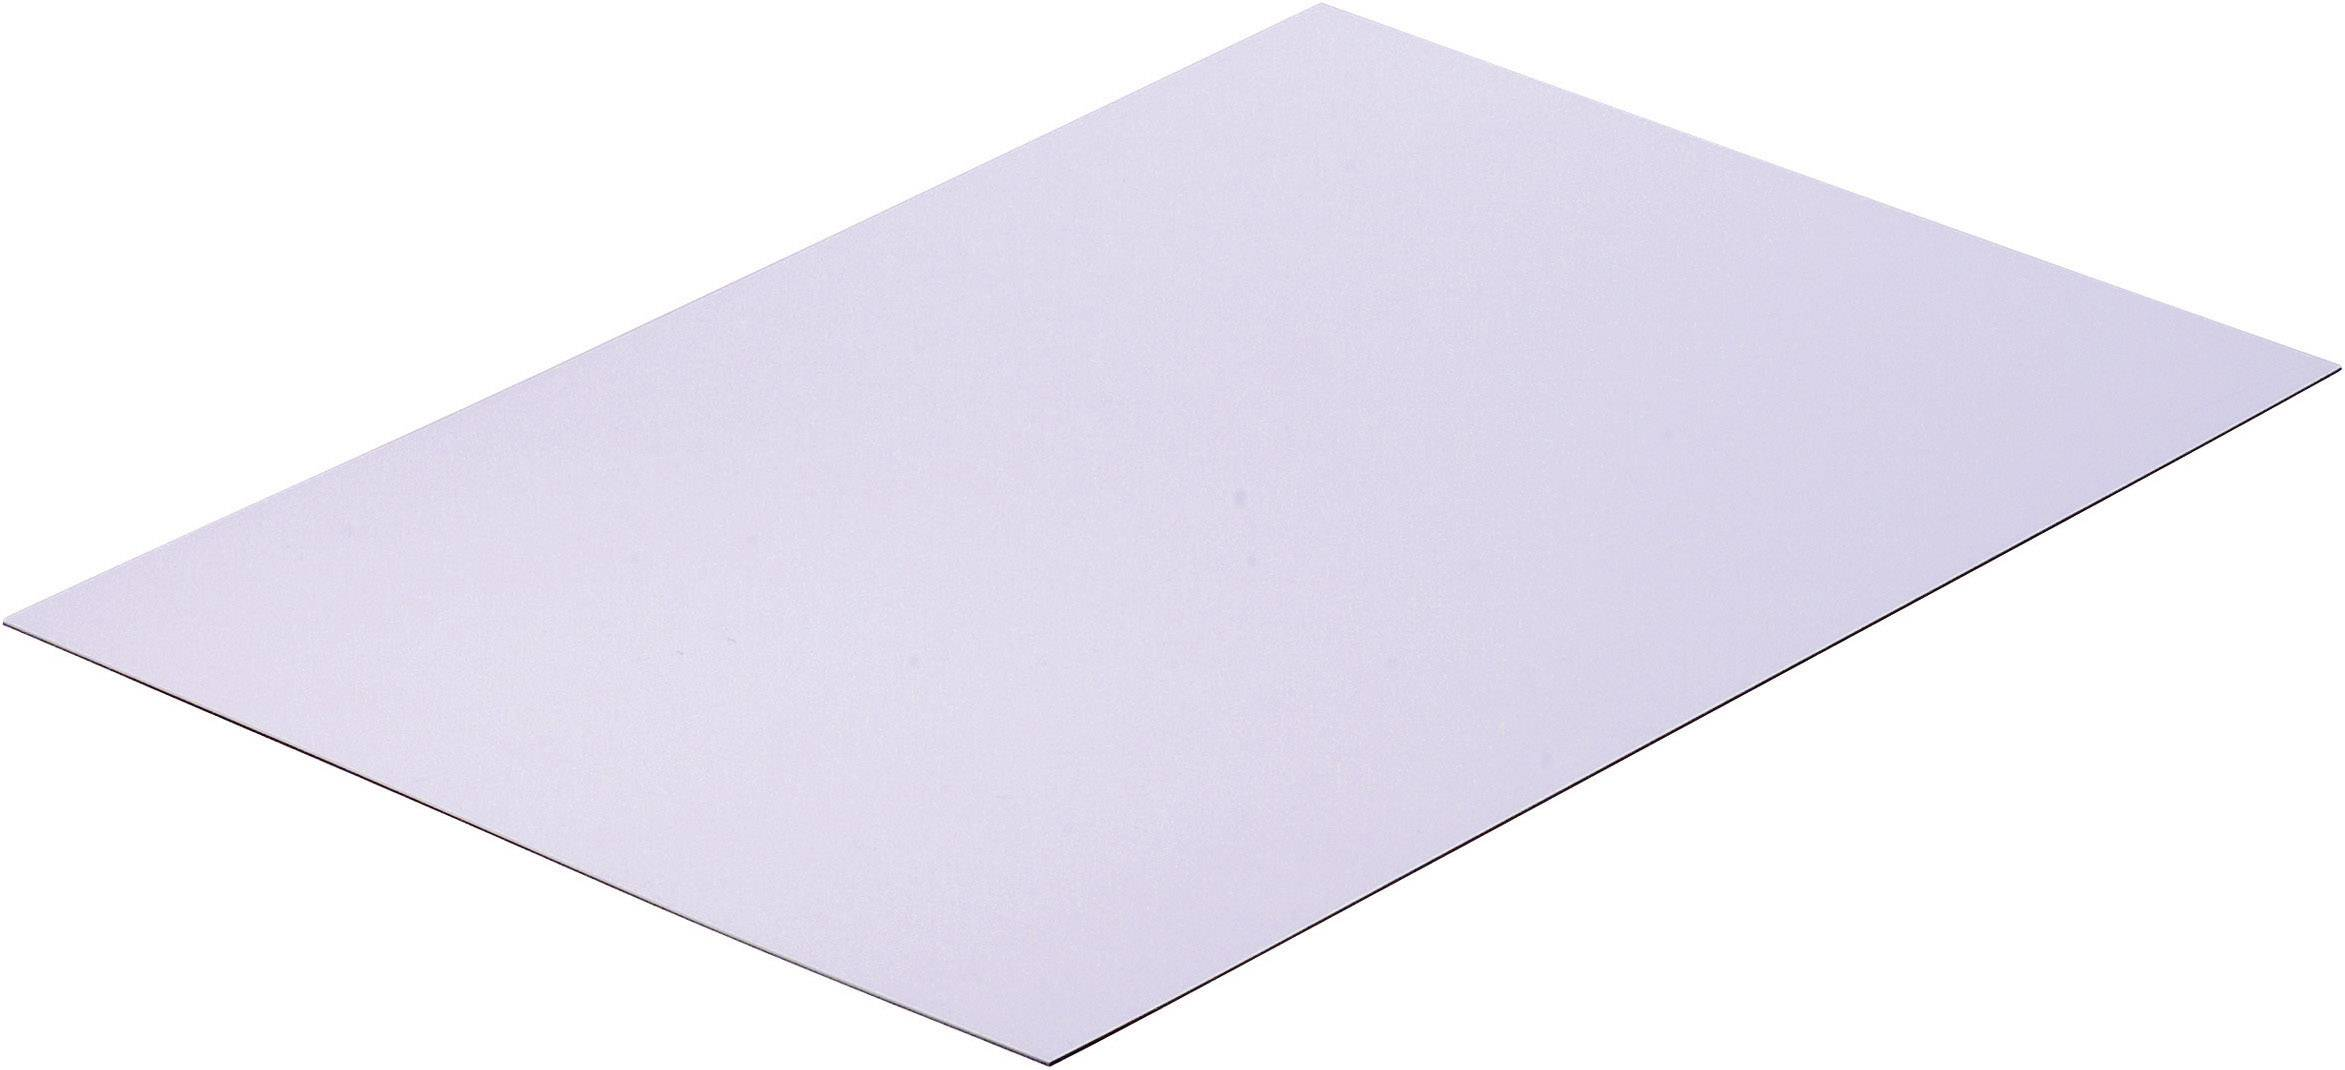 Polystyrenová deska bílá Modelcraft, 330 x 230 x 3,0 mm